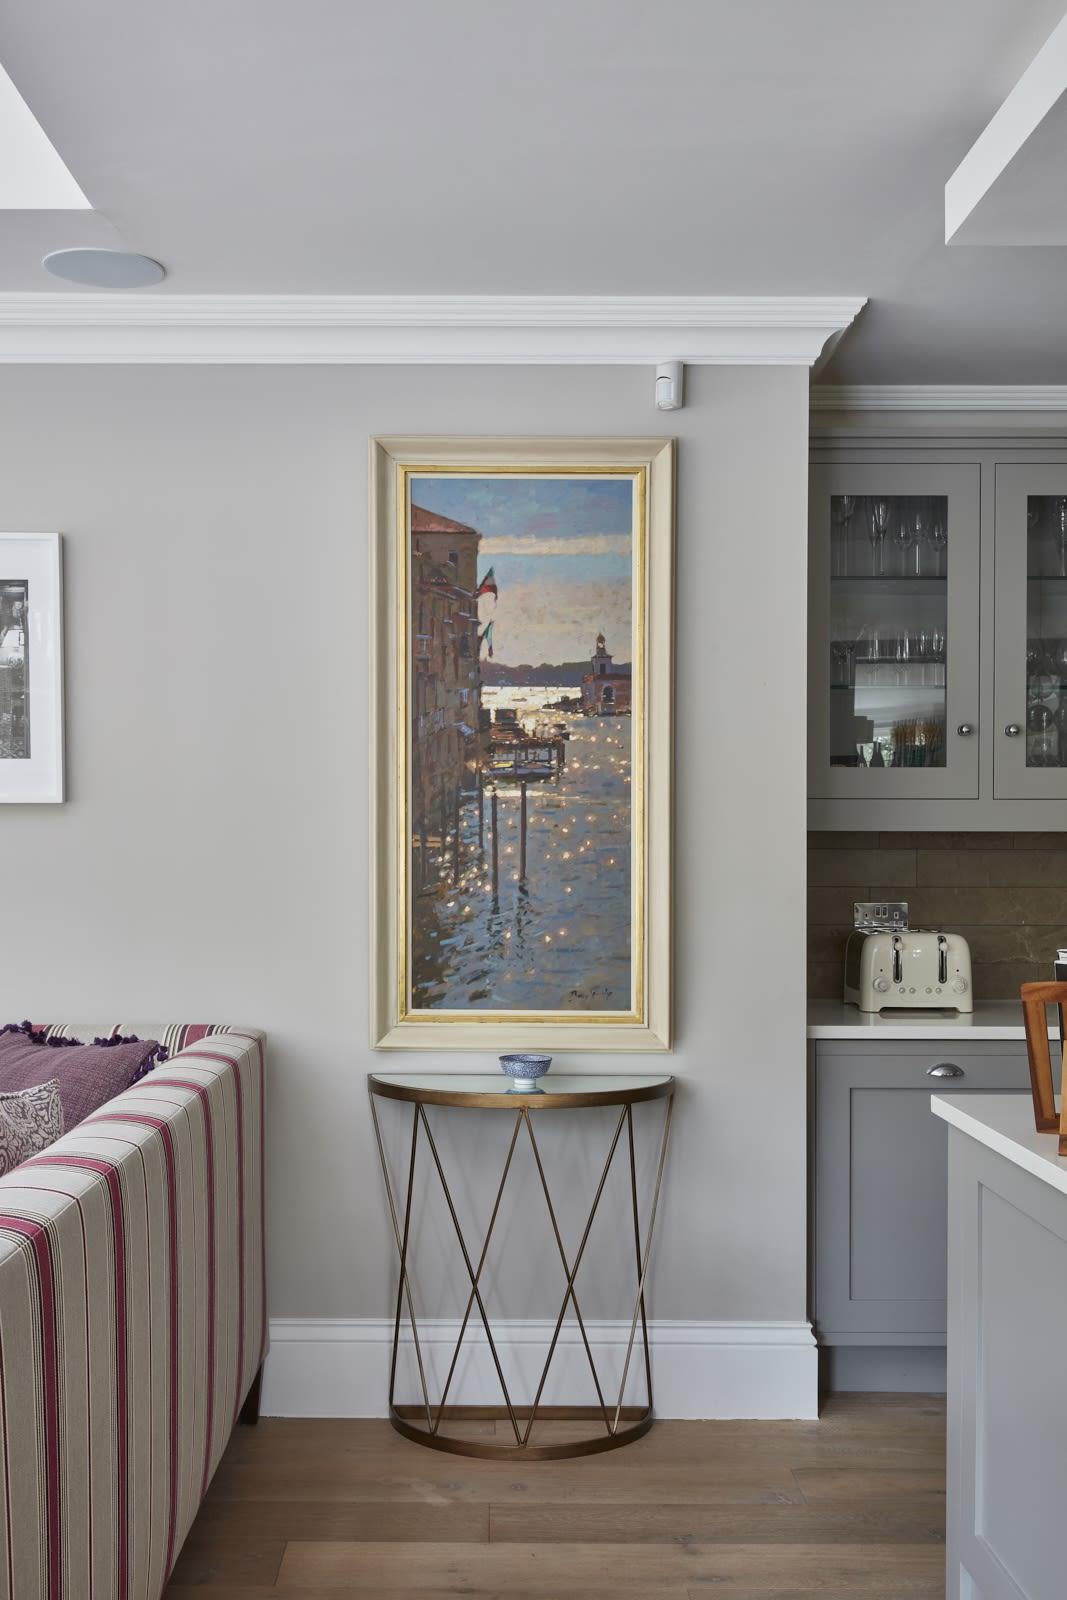 A stunning Bruce Yardley original painting chosen to compliment the portrait vignette